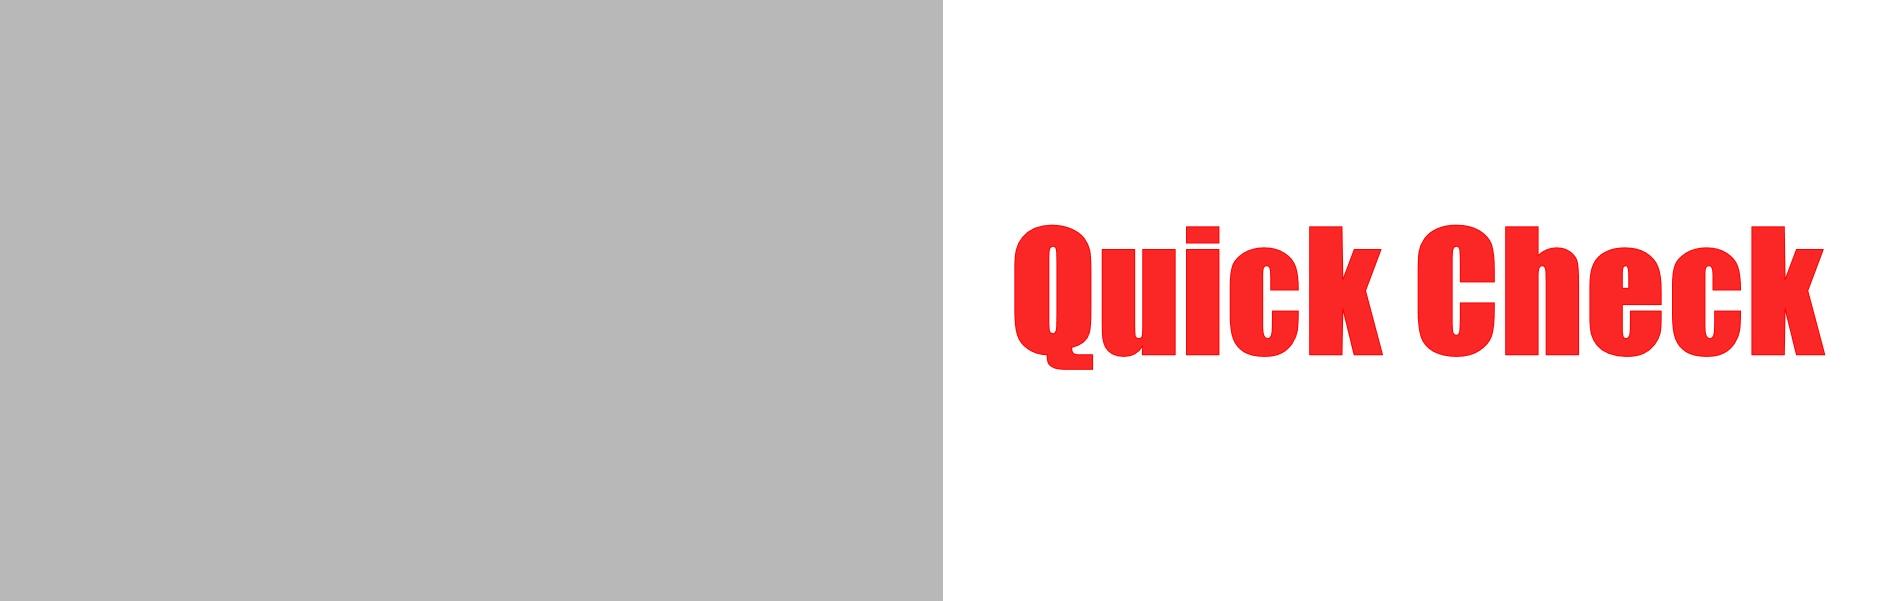 QuickCheckの文字画像